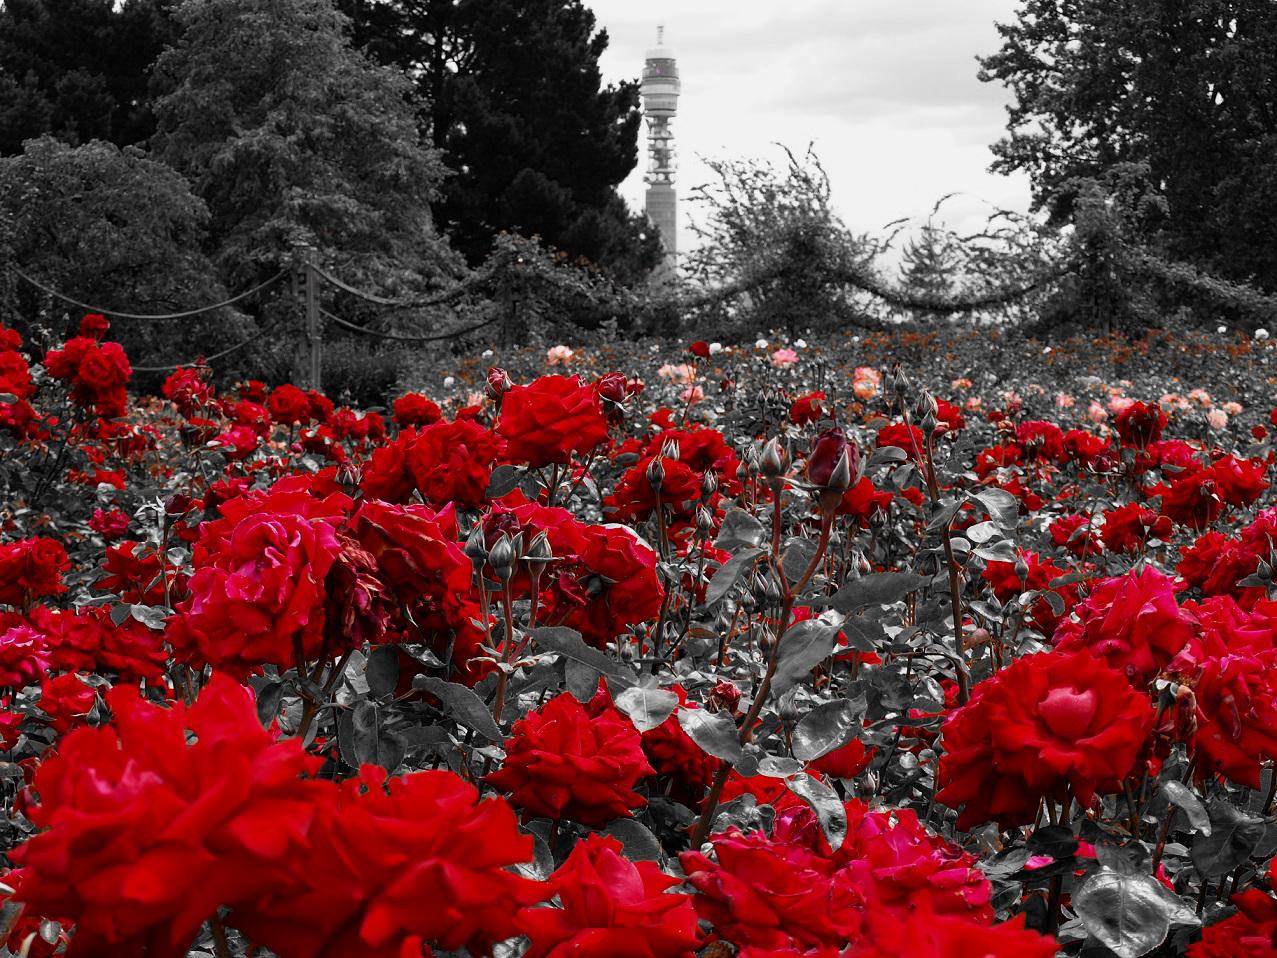 f r dich solls rote rosen regnen foto bild archiv projekte naturchannel monatswettbewerb. Black Bedroom Furniture Sets. Home Design Ideas